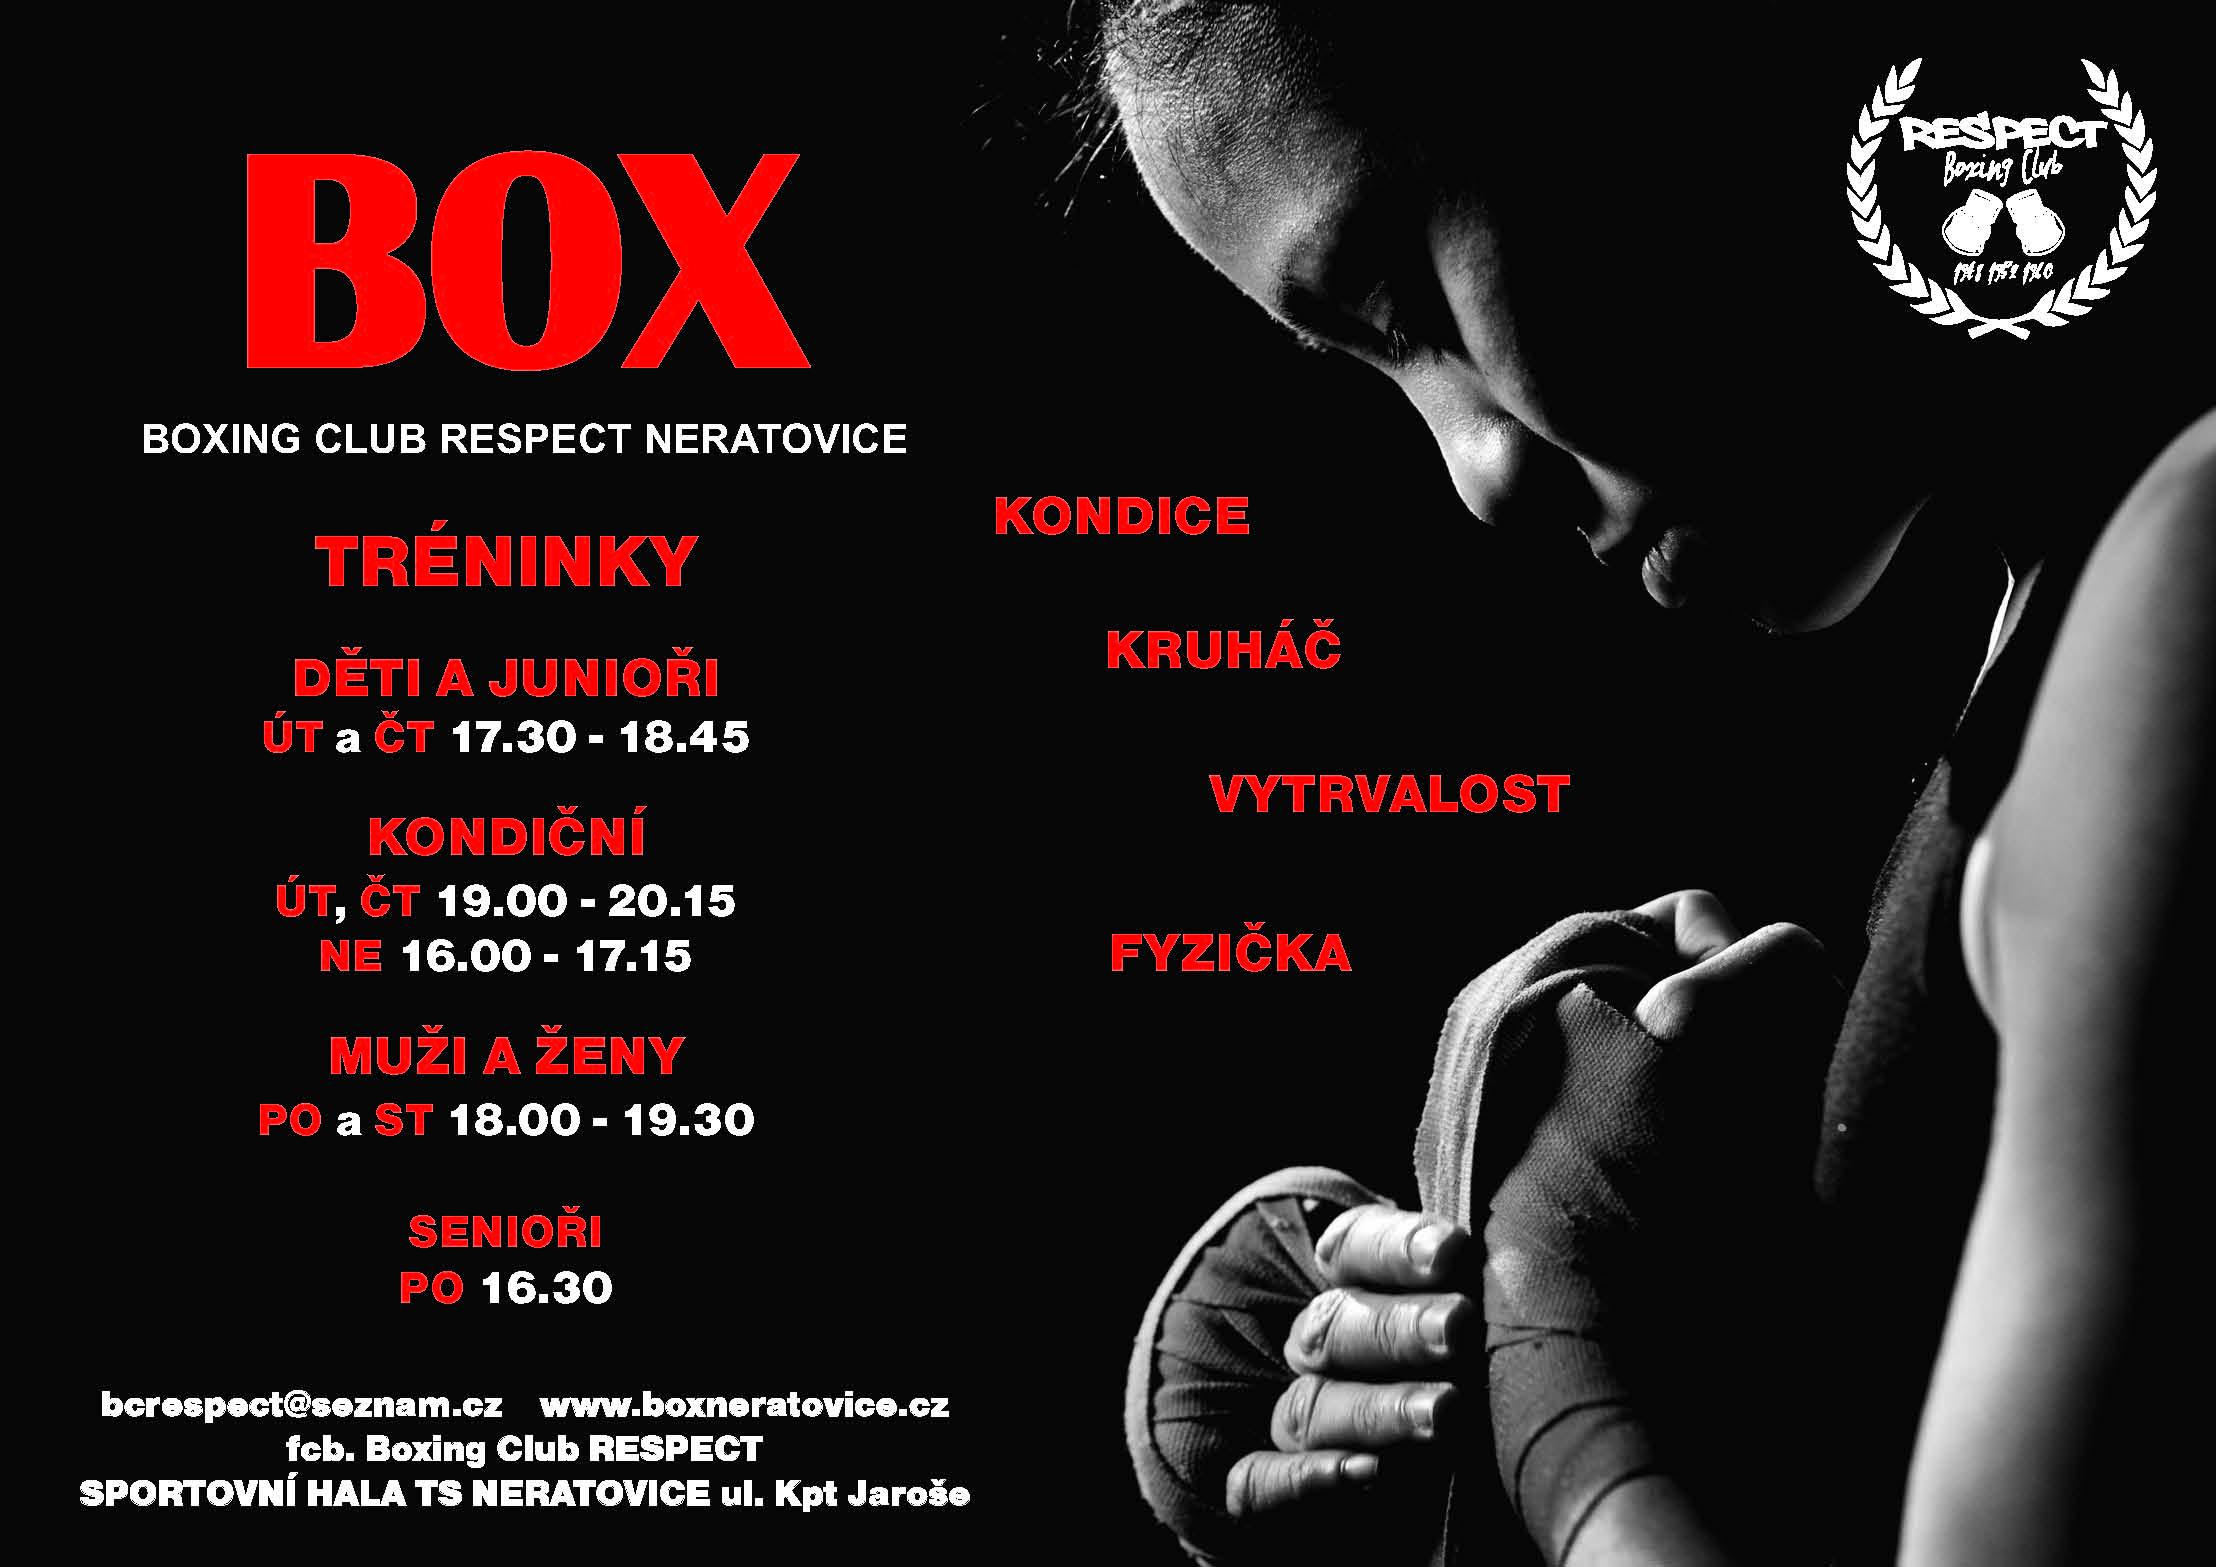 plakat_box (1)